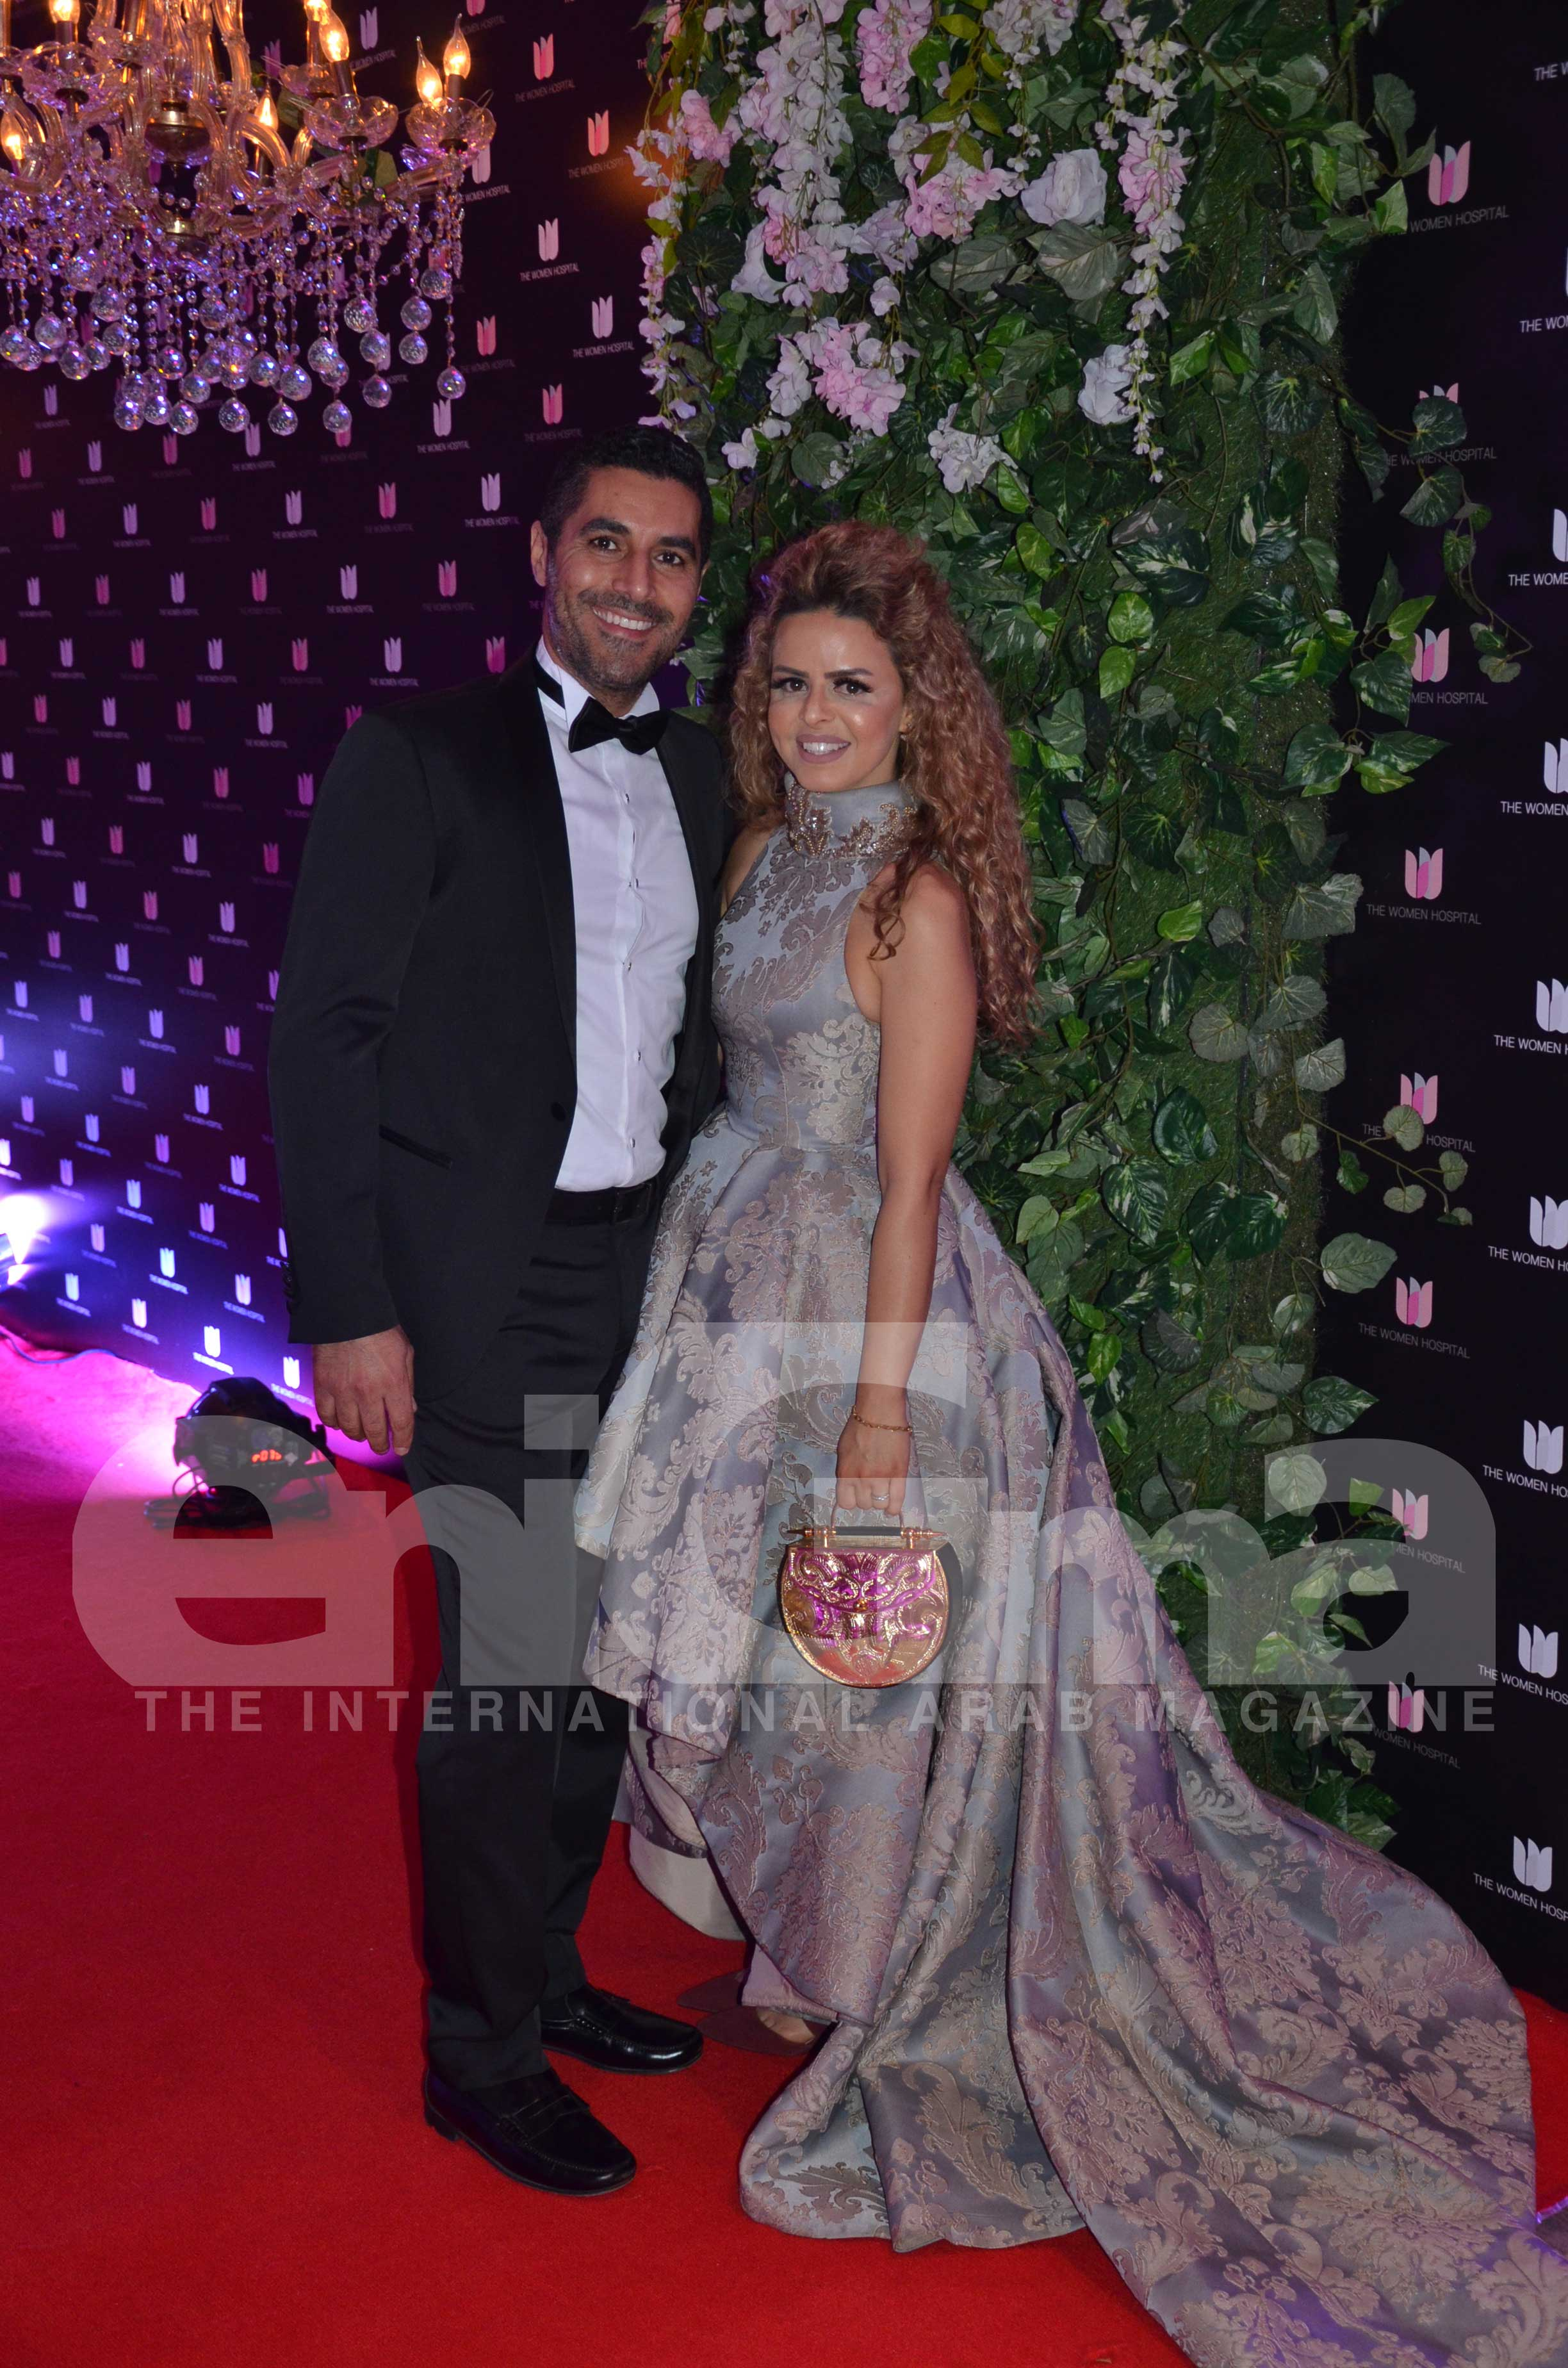 Mr. Ayman Salem & Ms. Sherry Hamdy